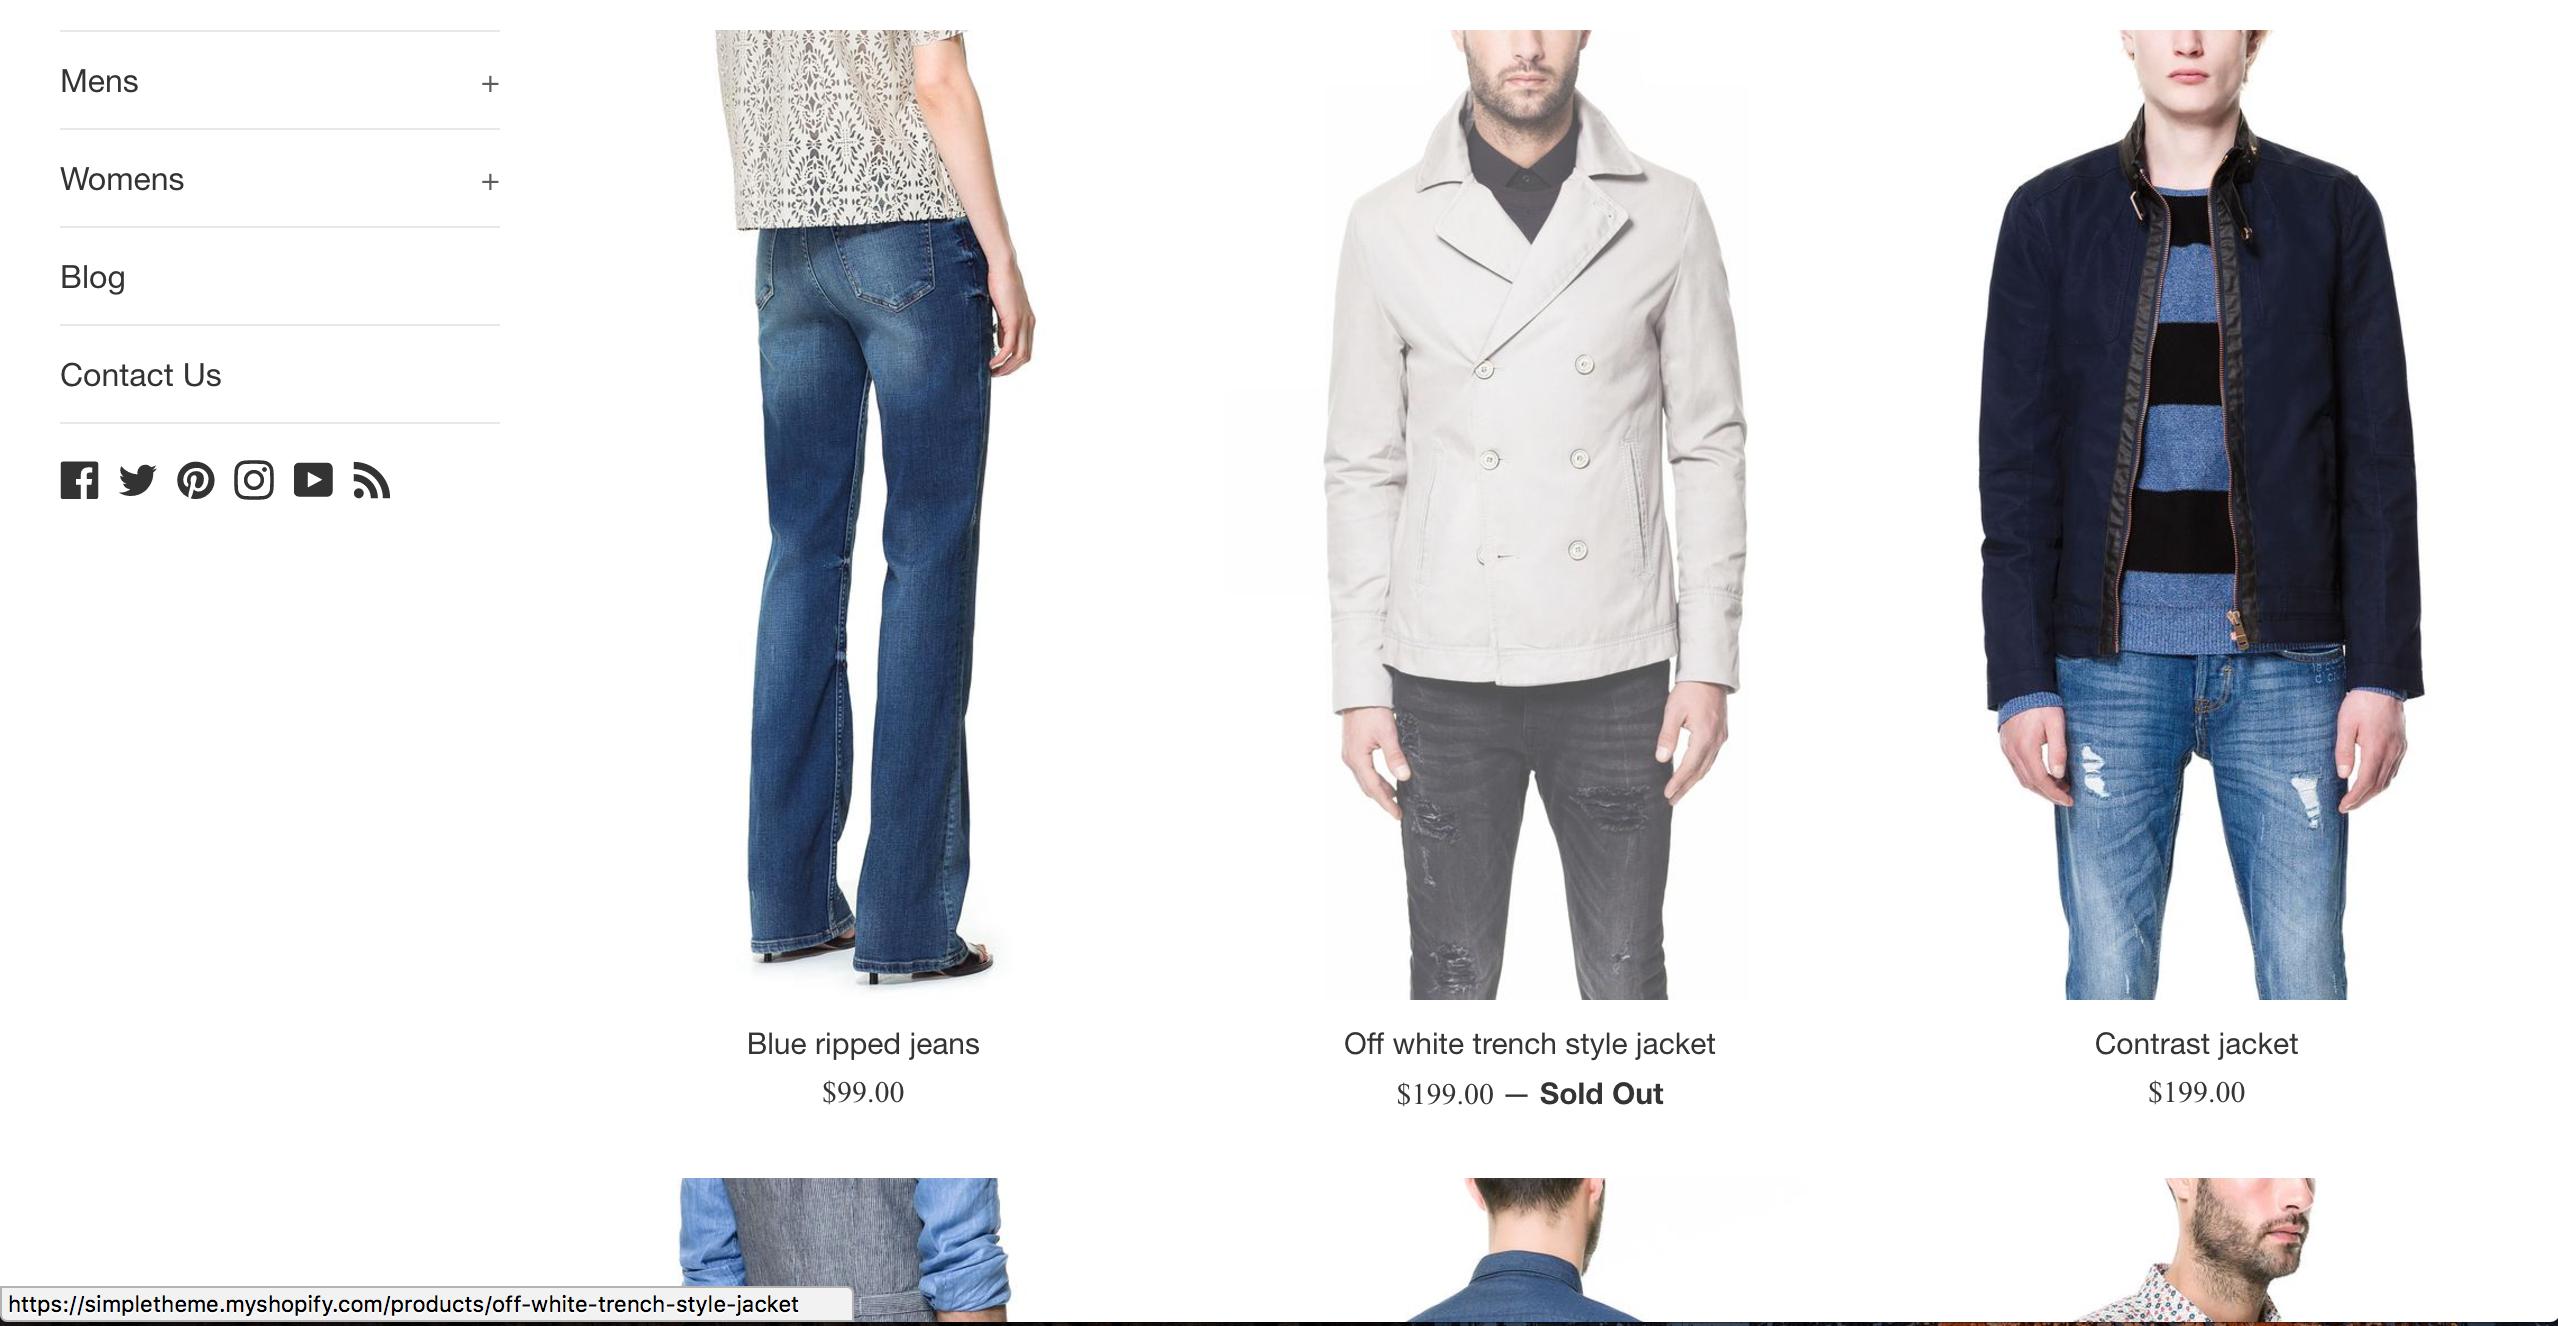 Shop website creation